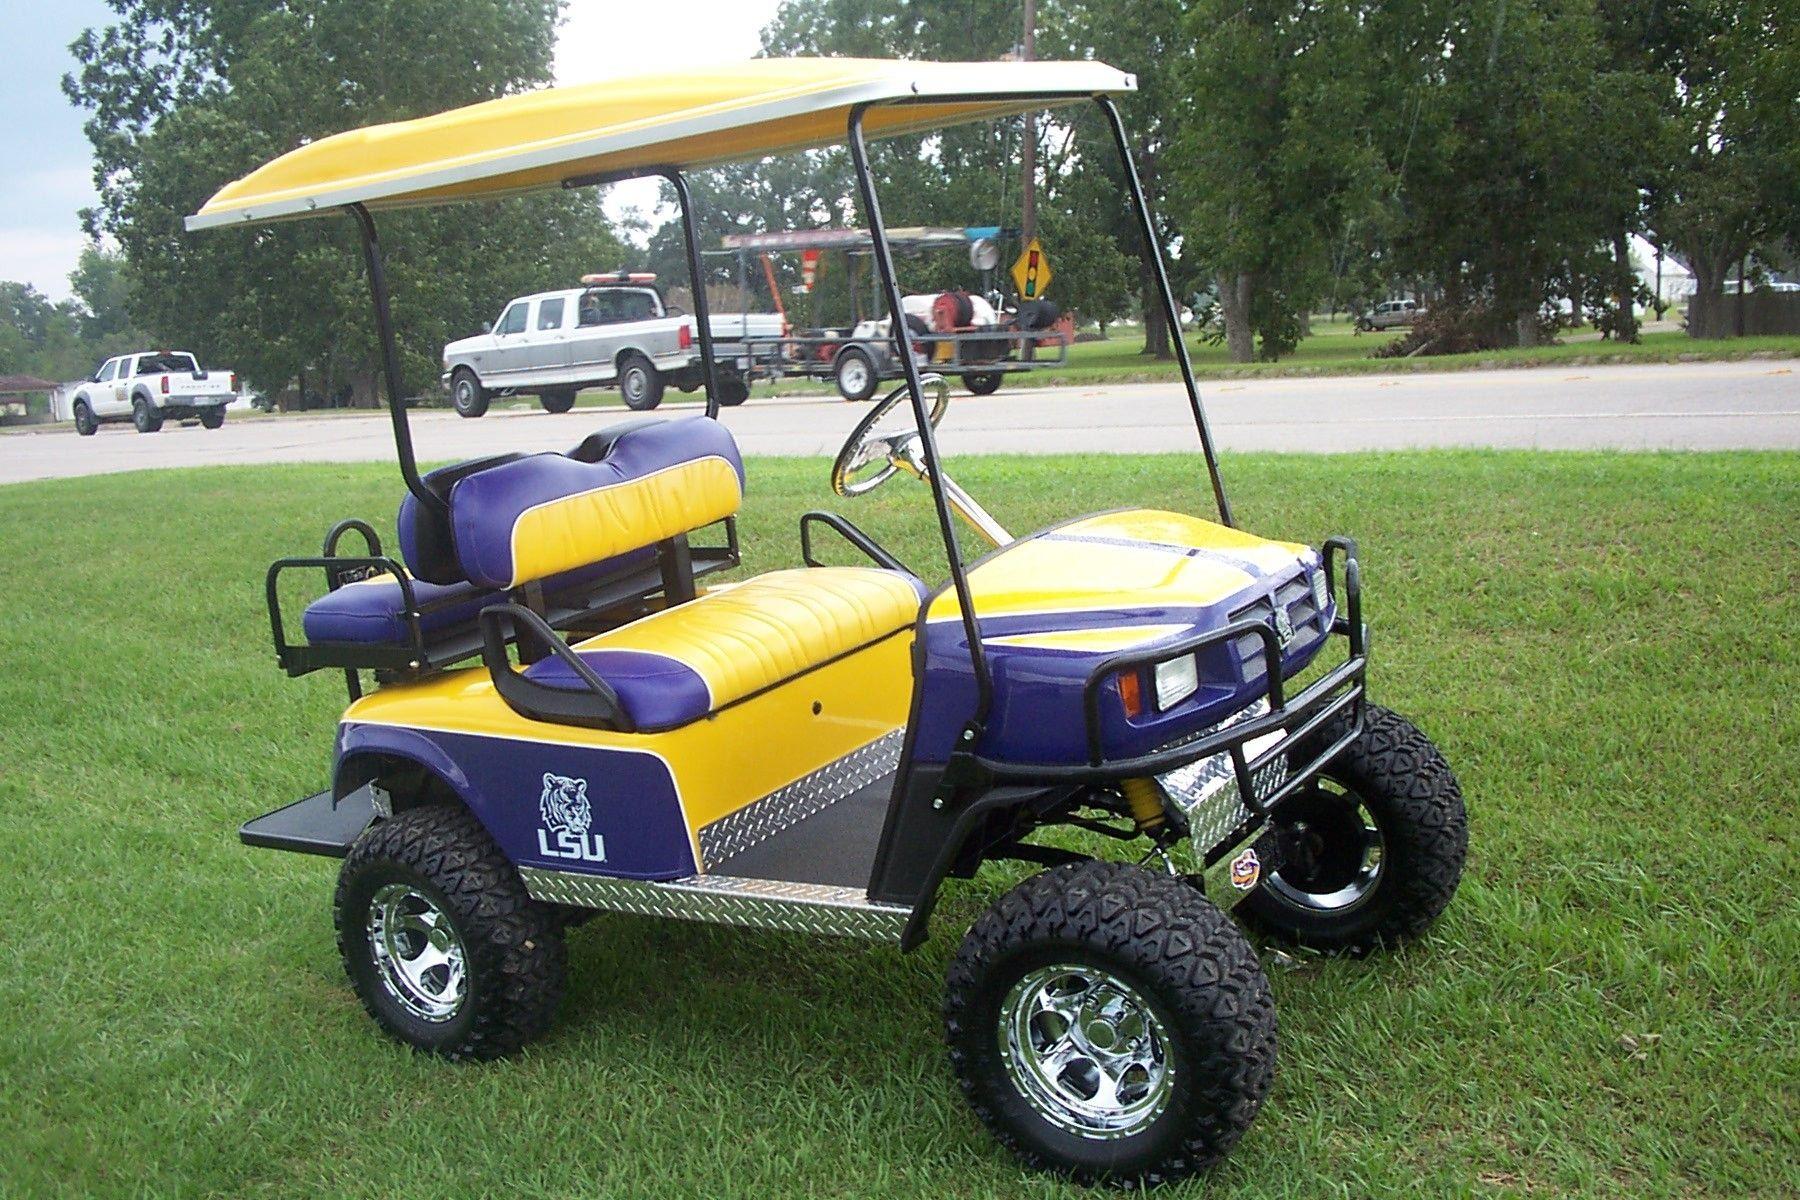 Handmade Lsu Golf Cart by Bayou Boogie Customs | CustomMade.com